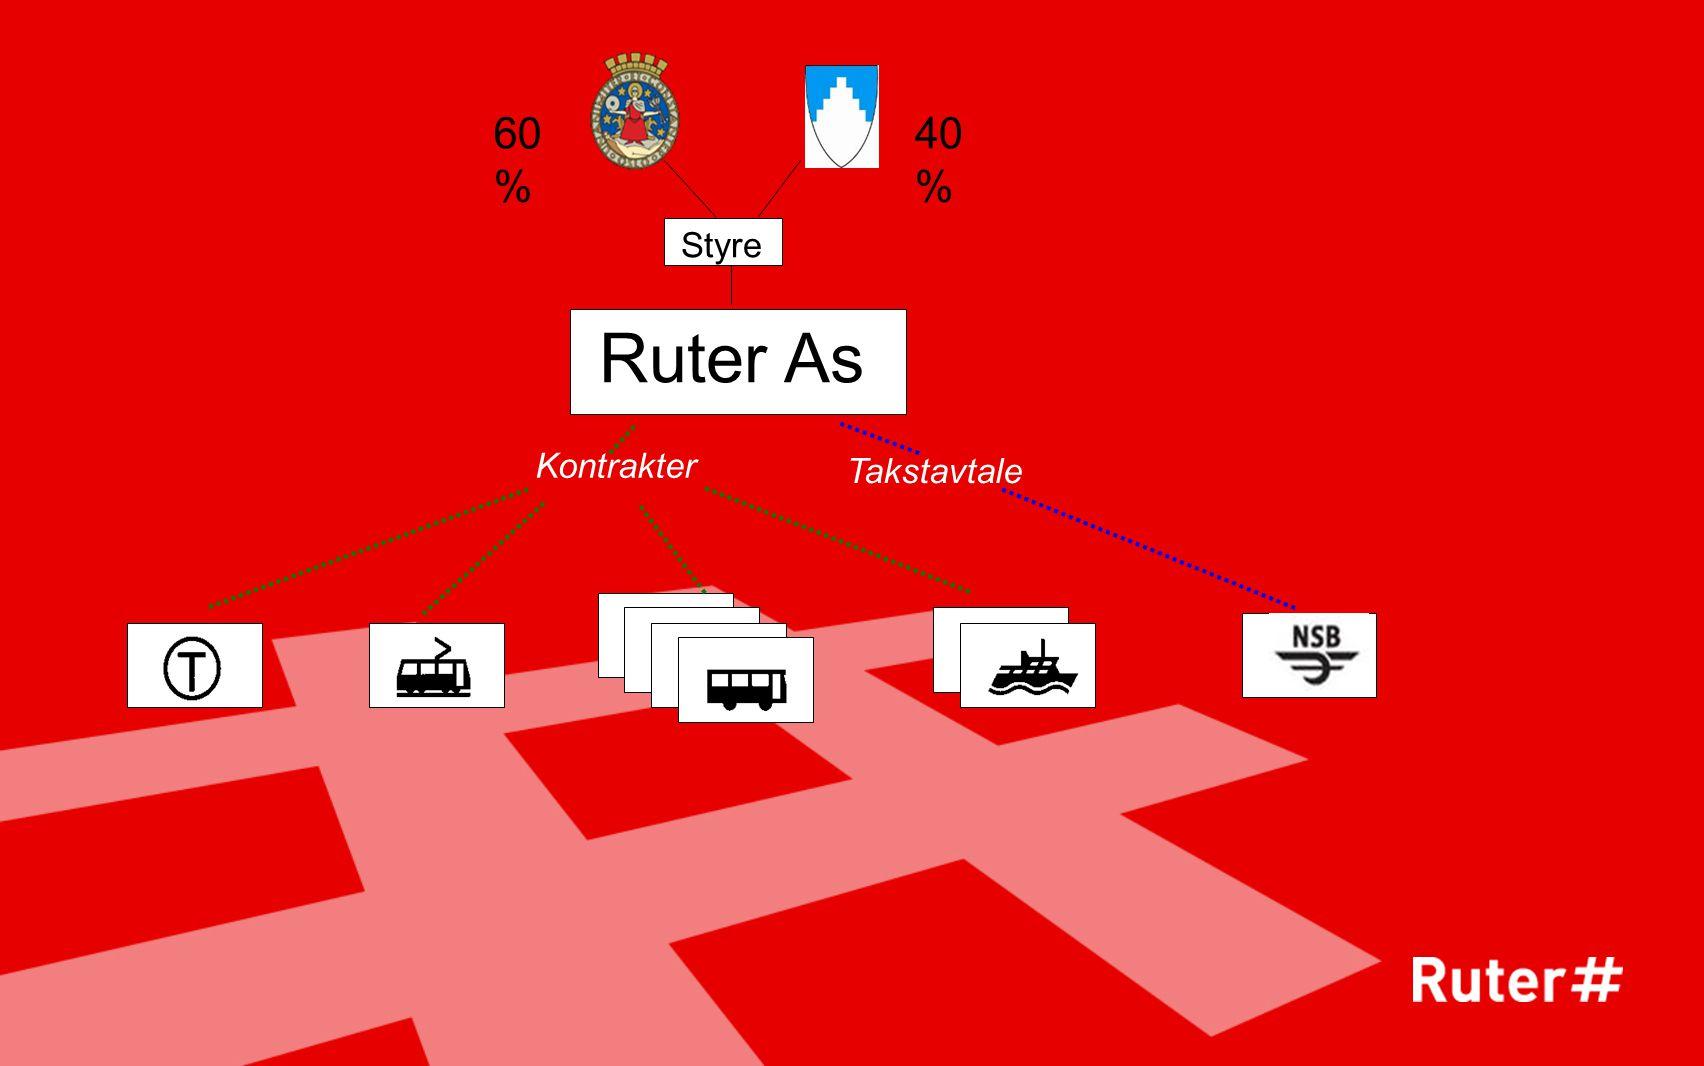 Kontrakter Takstavtale Ruter As 40 % Styre 60 %